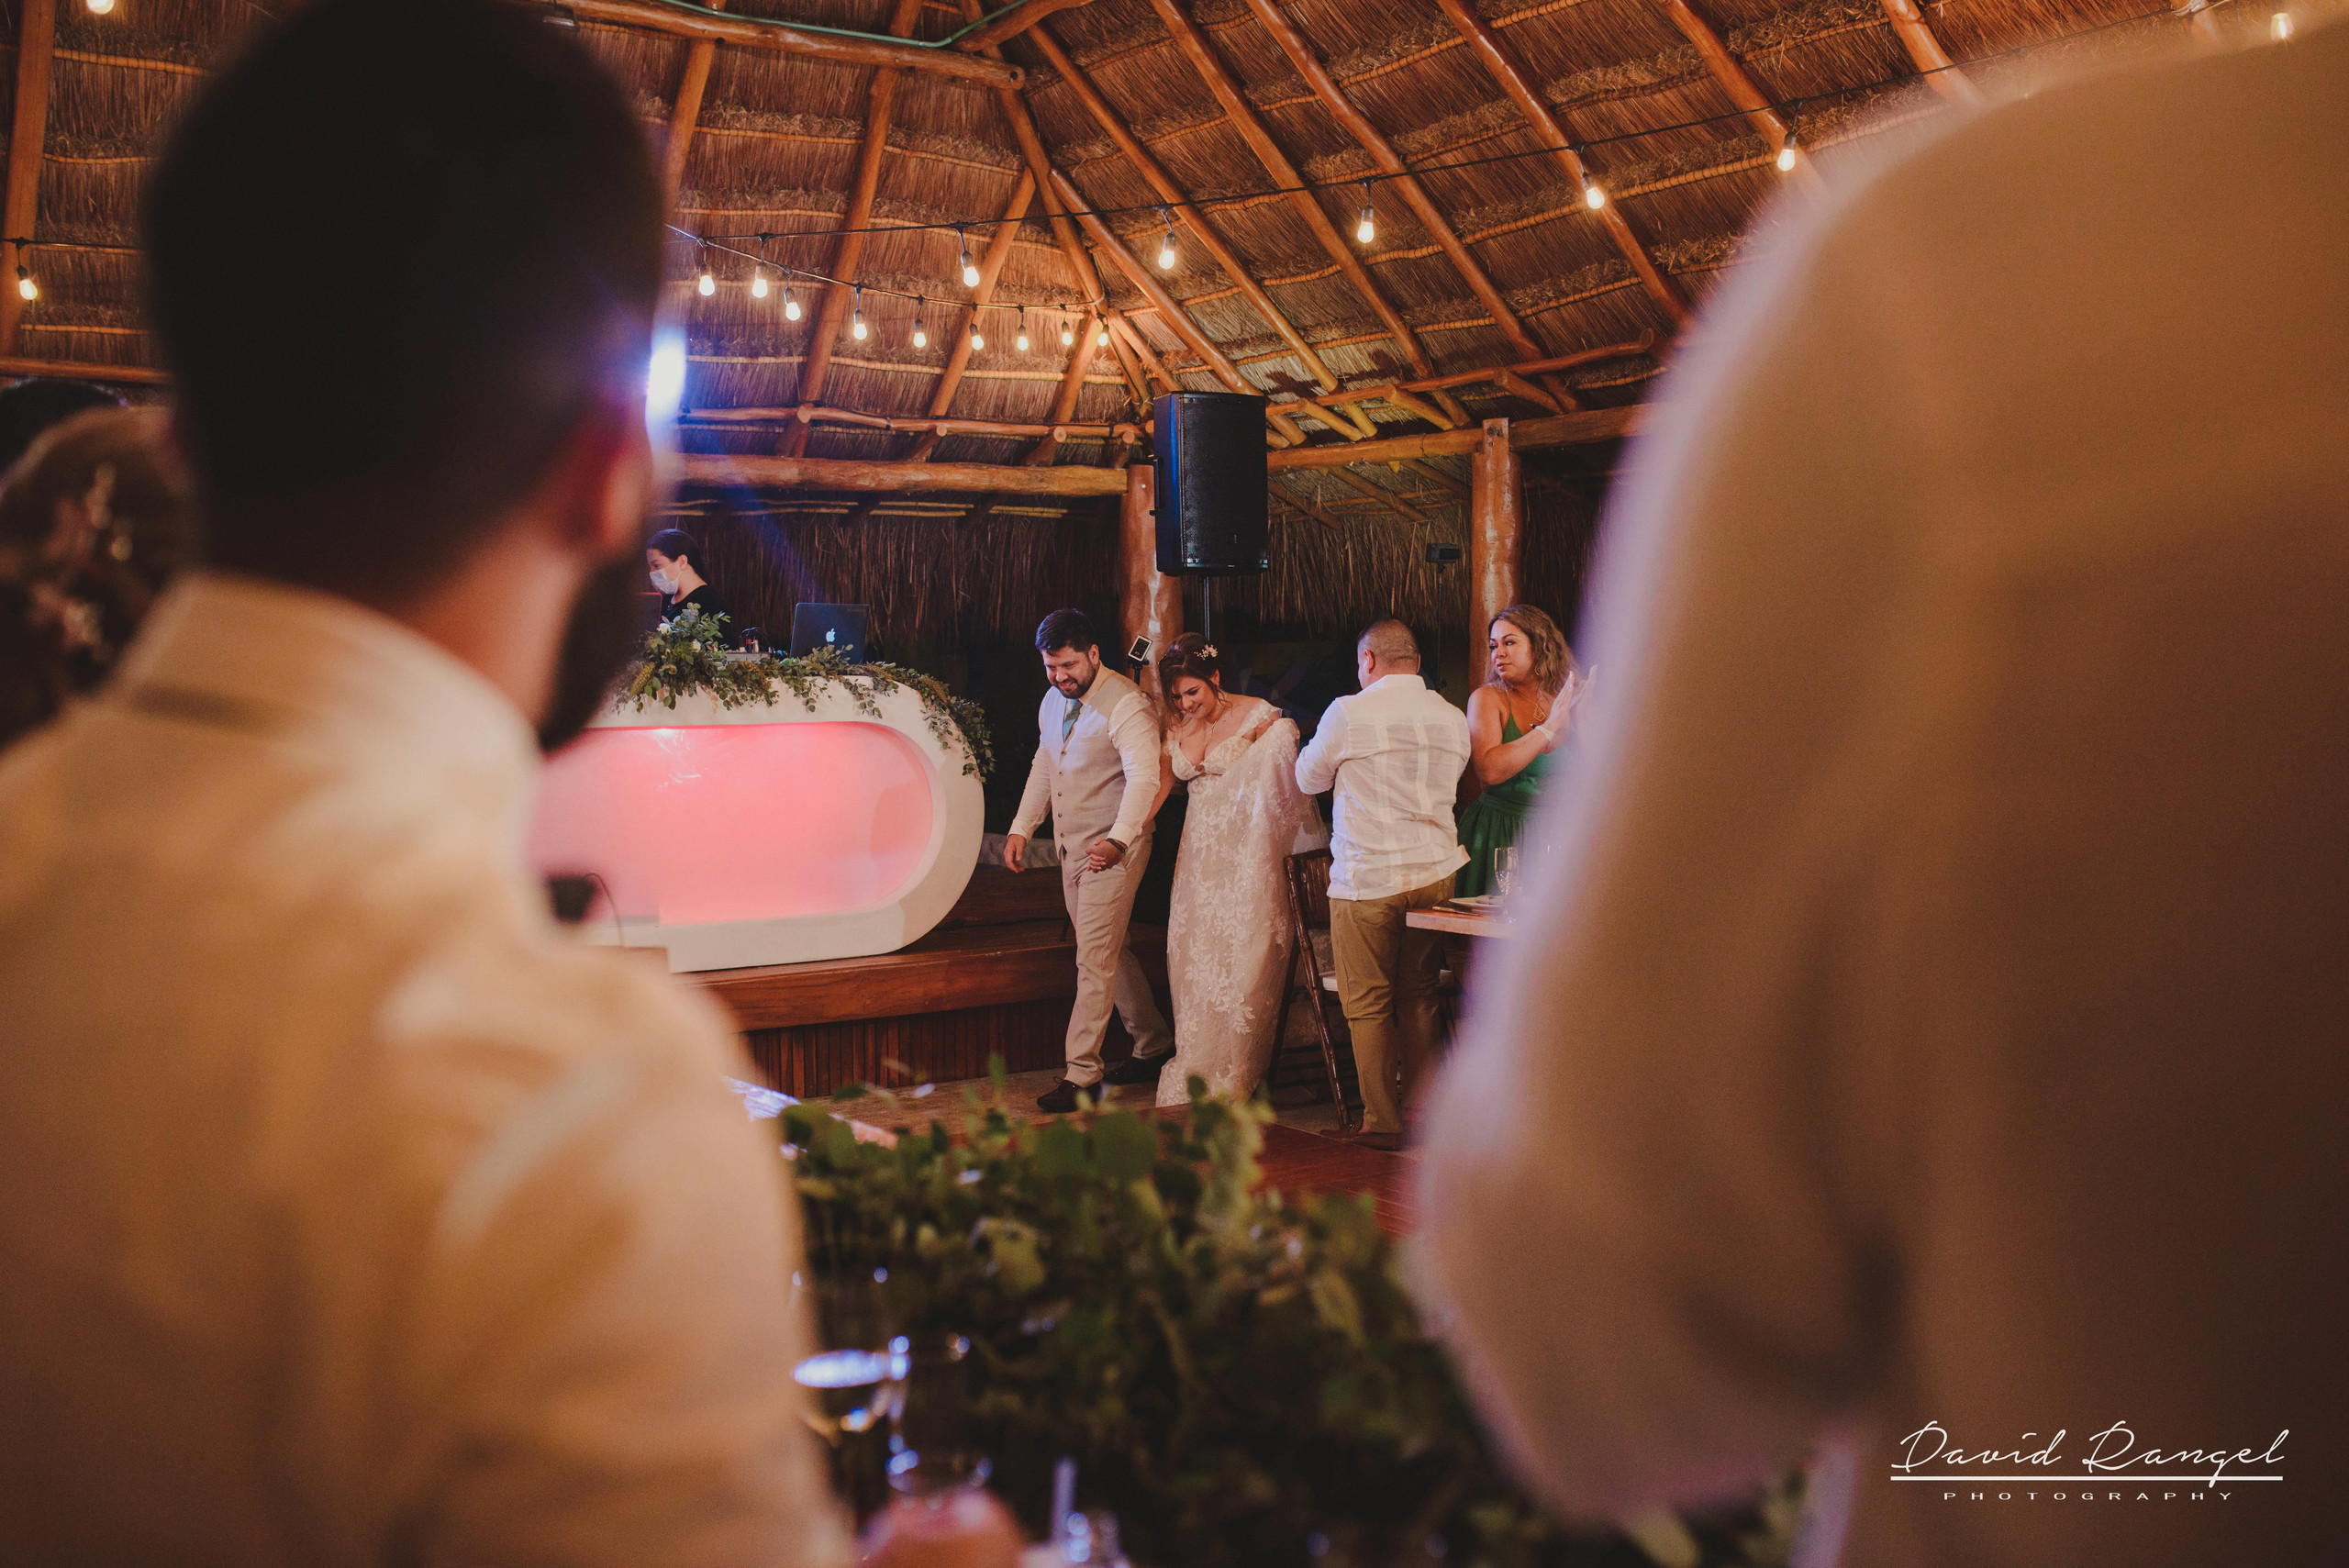 bride+groom+beach+session+happy+love+couple+celebration+wedding+photo+beach+caribean+sea+photographer+david+rangel+dress+suit+villa+chenera+maain+entrance+reception